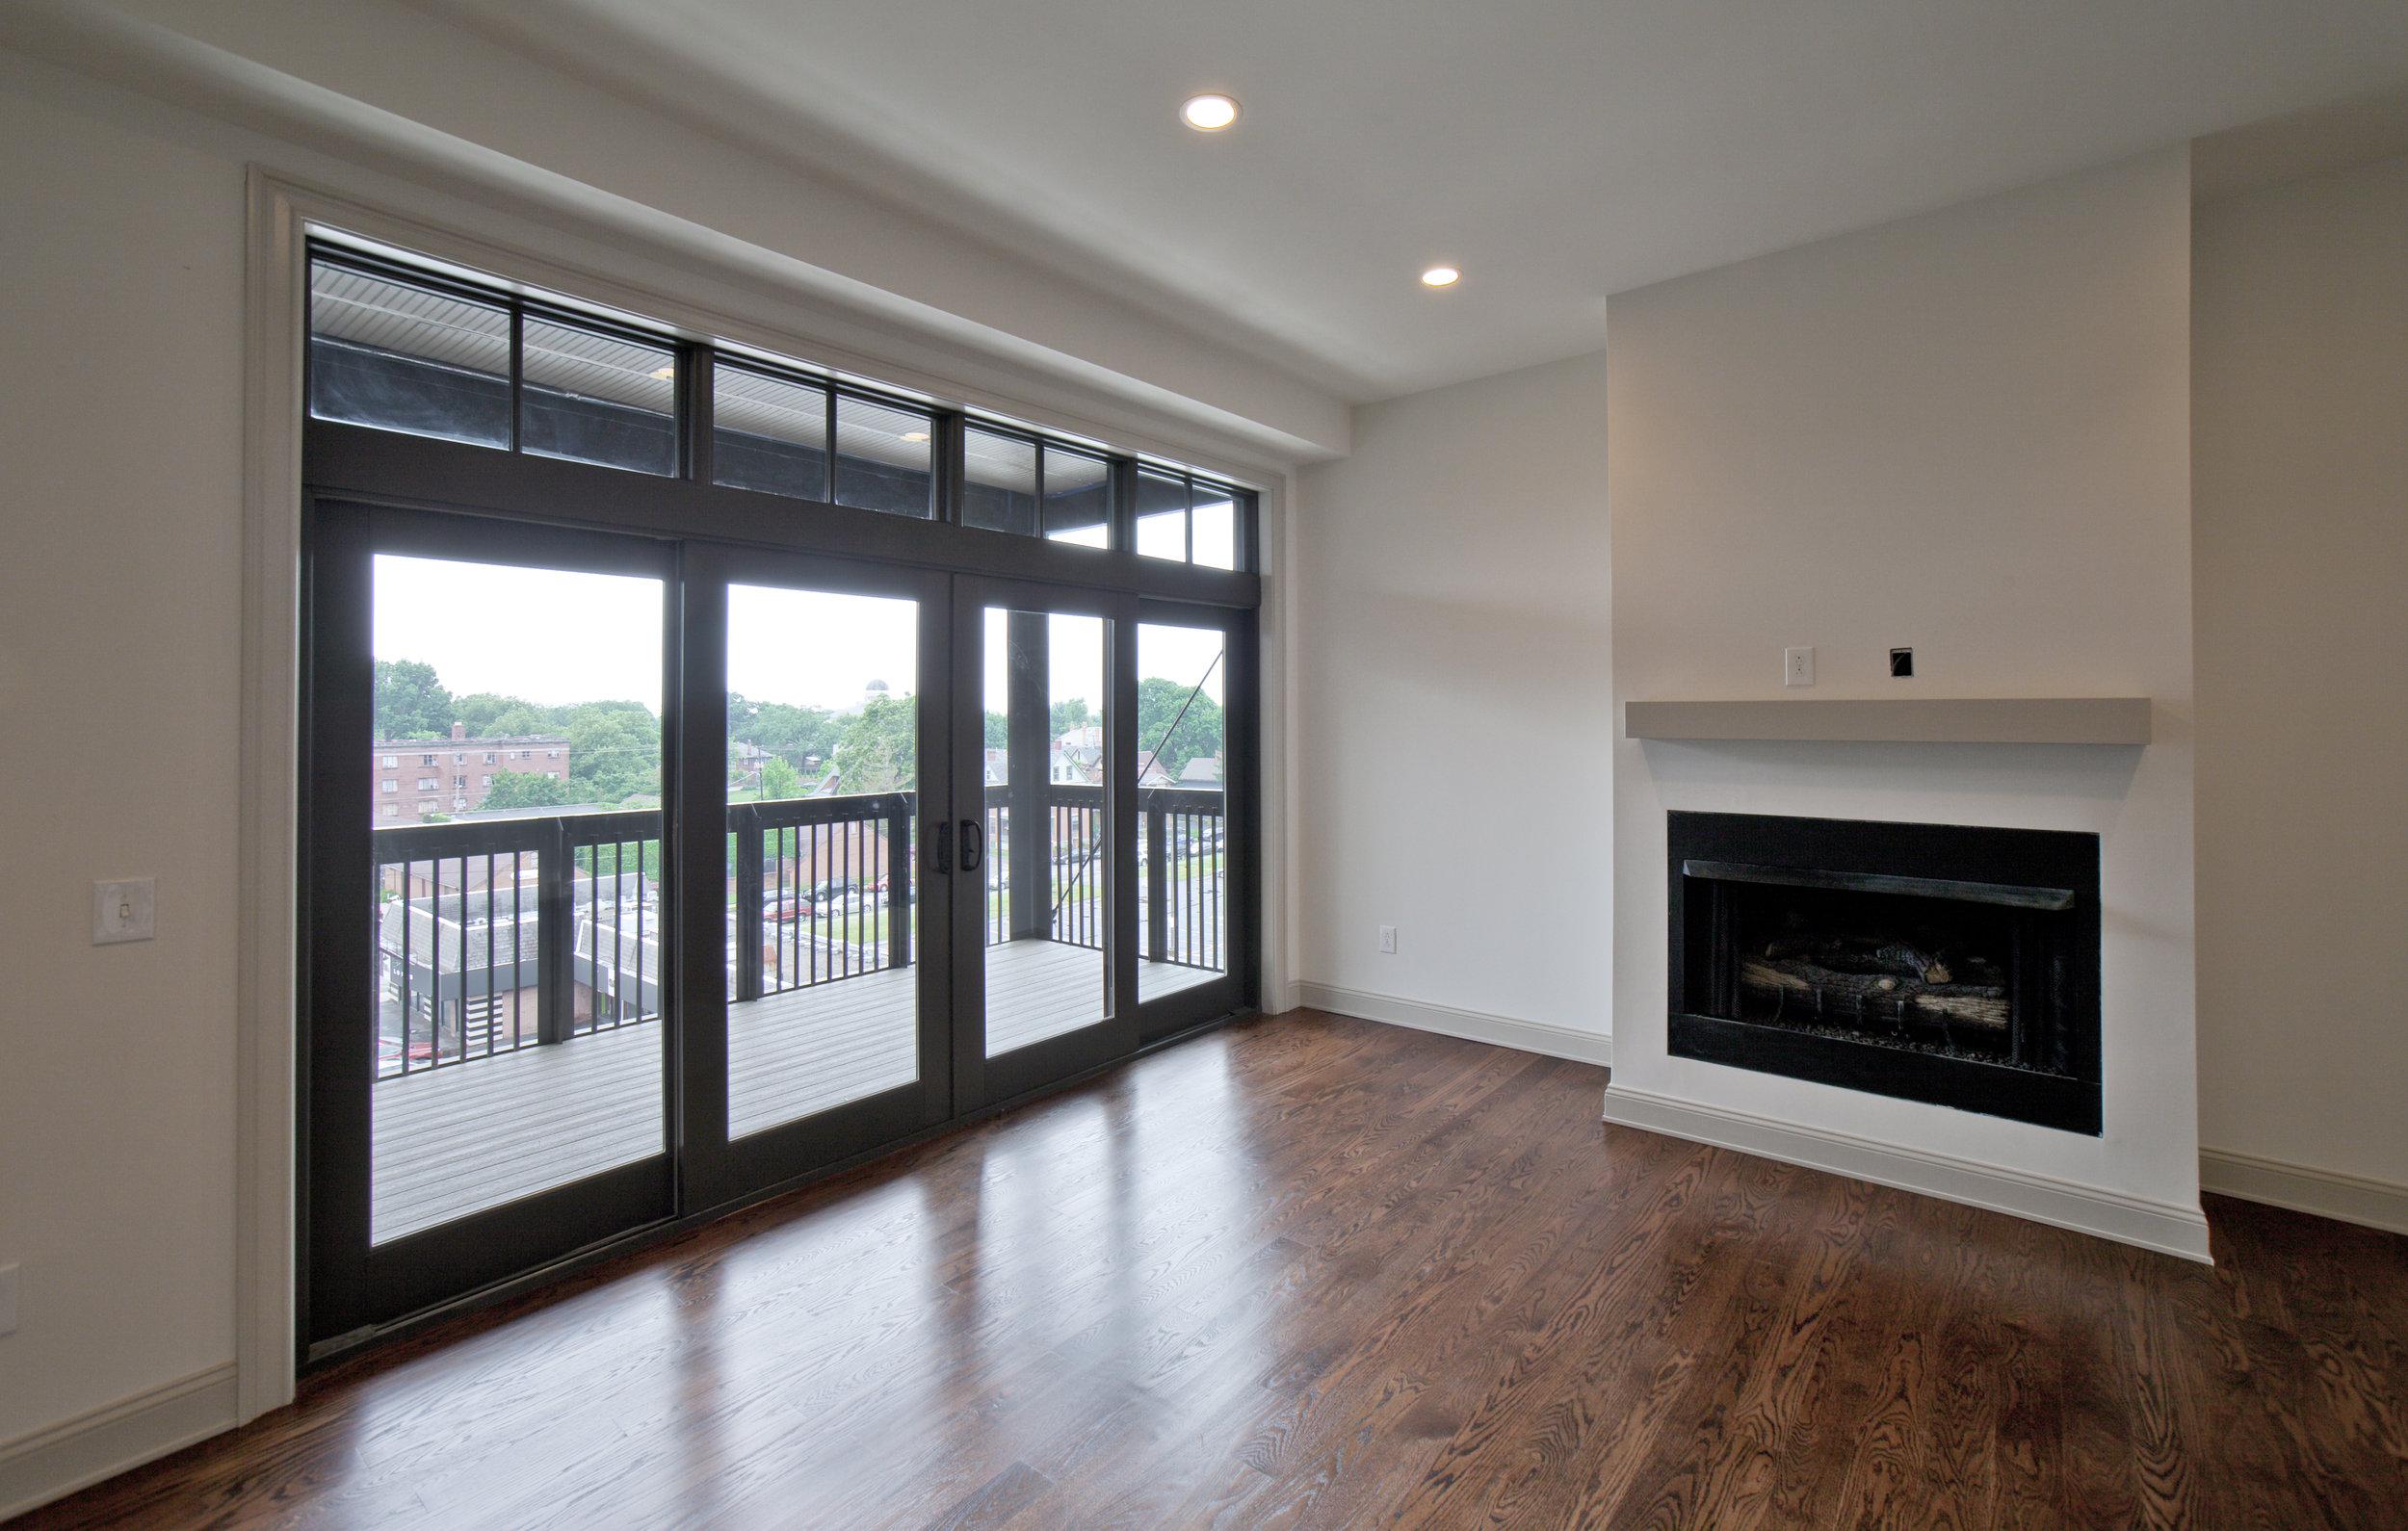 Wood Co. Apartments Rear Balcony View Hi.jpg